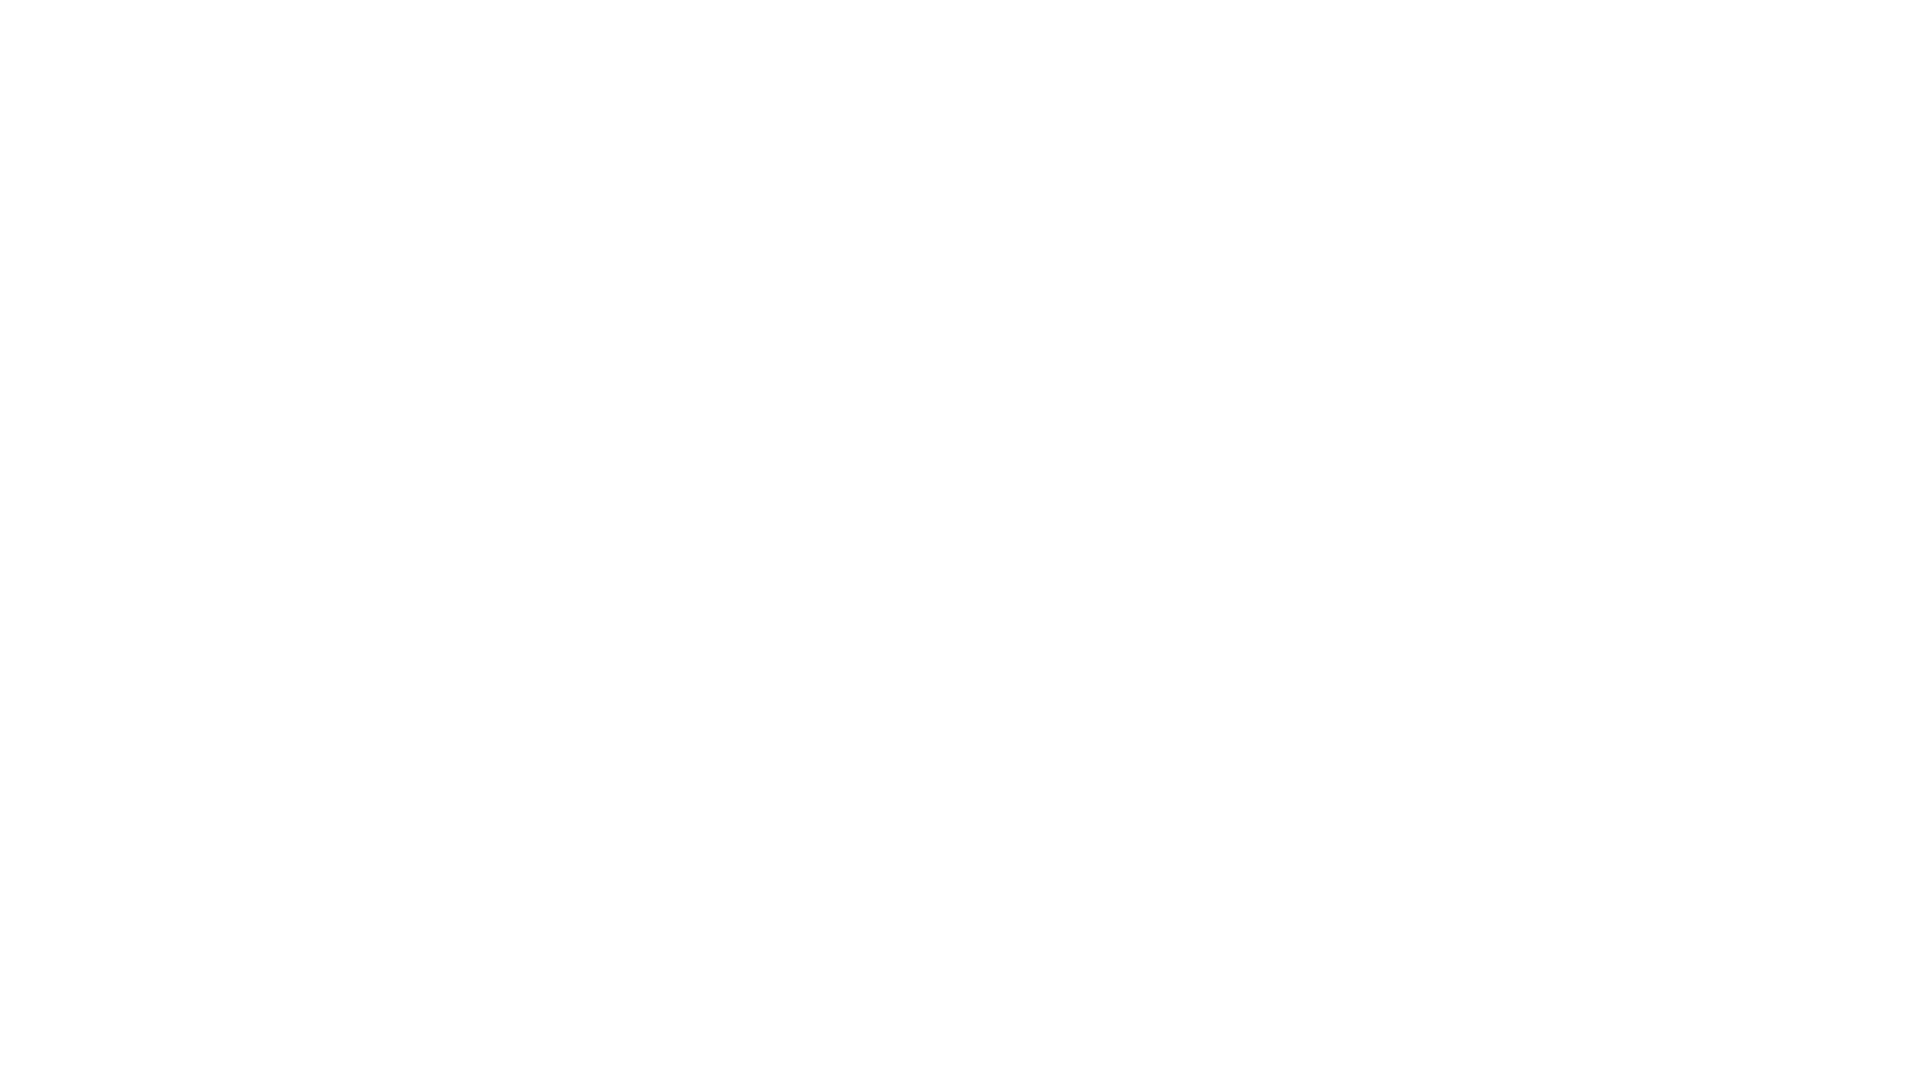 Caribbean Map Outline